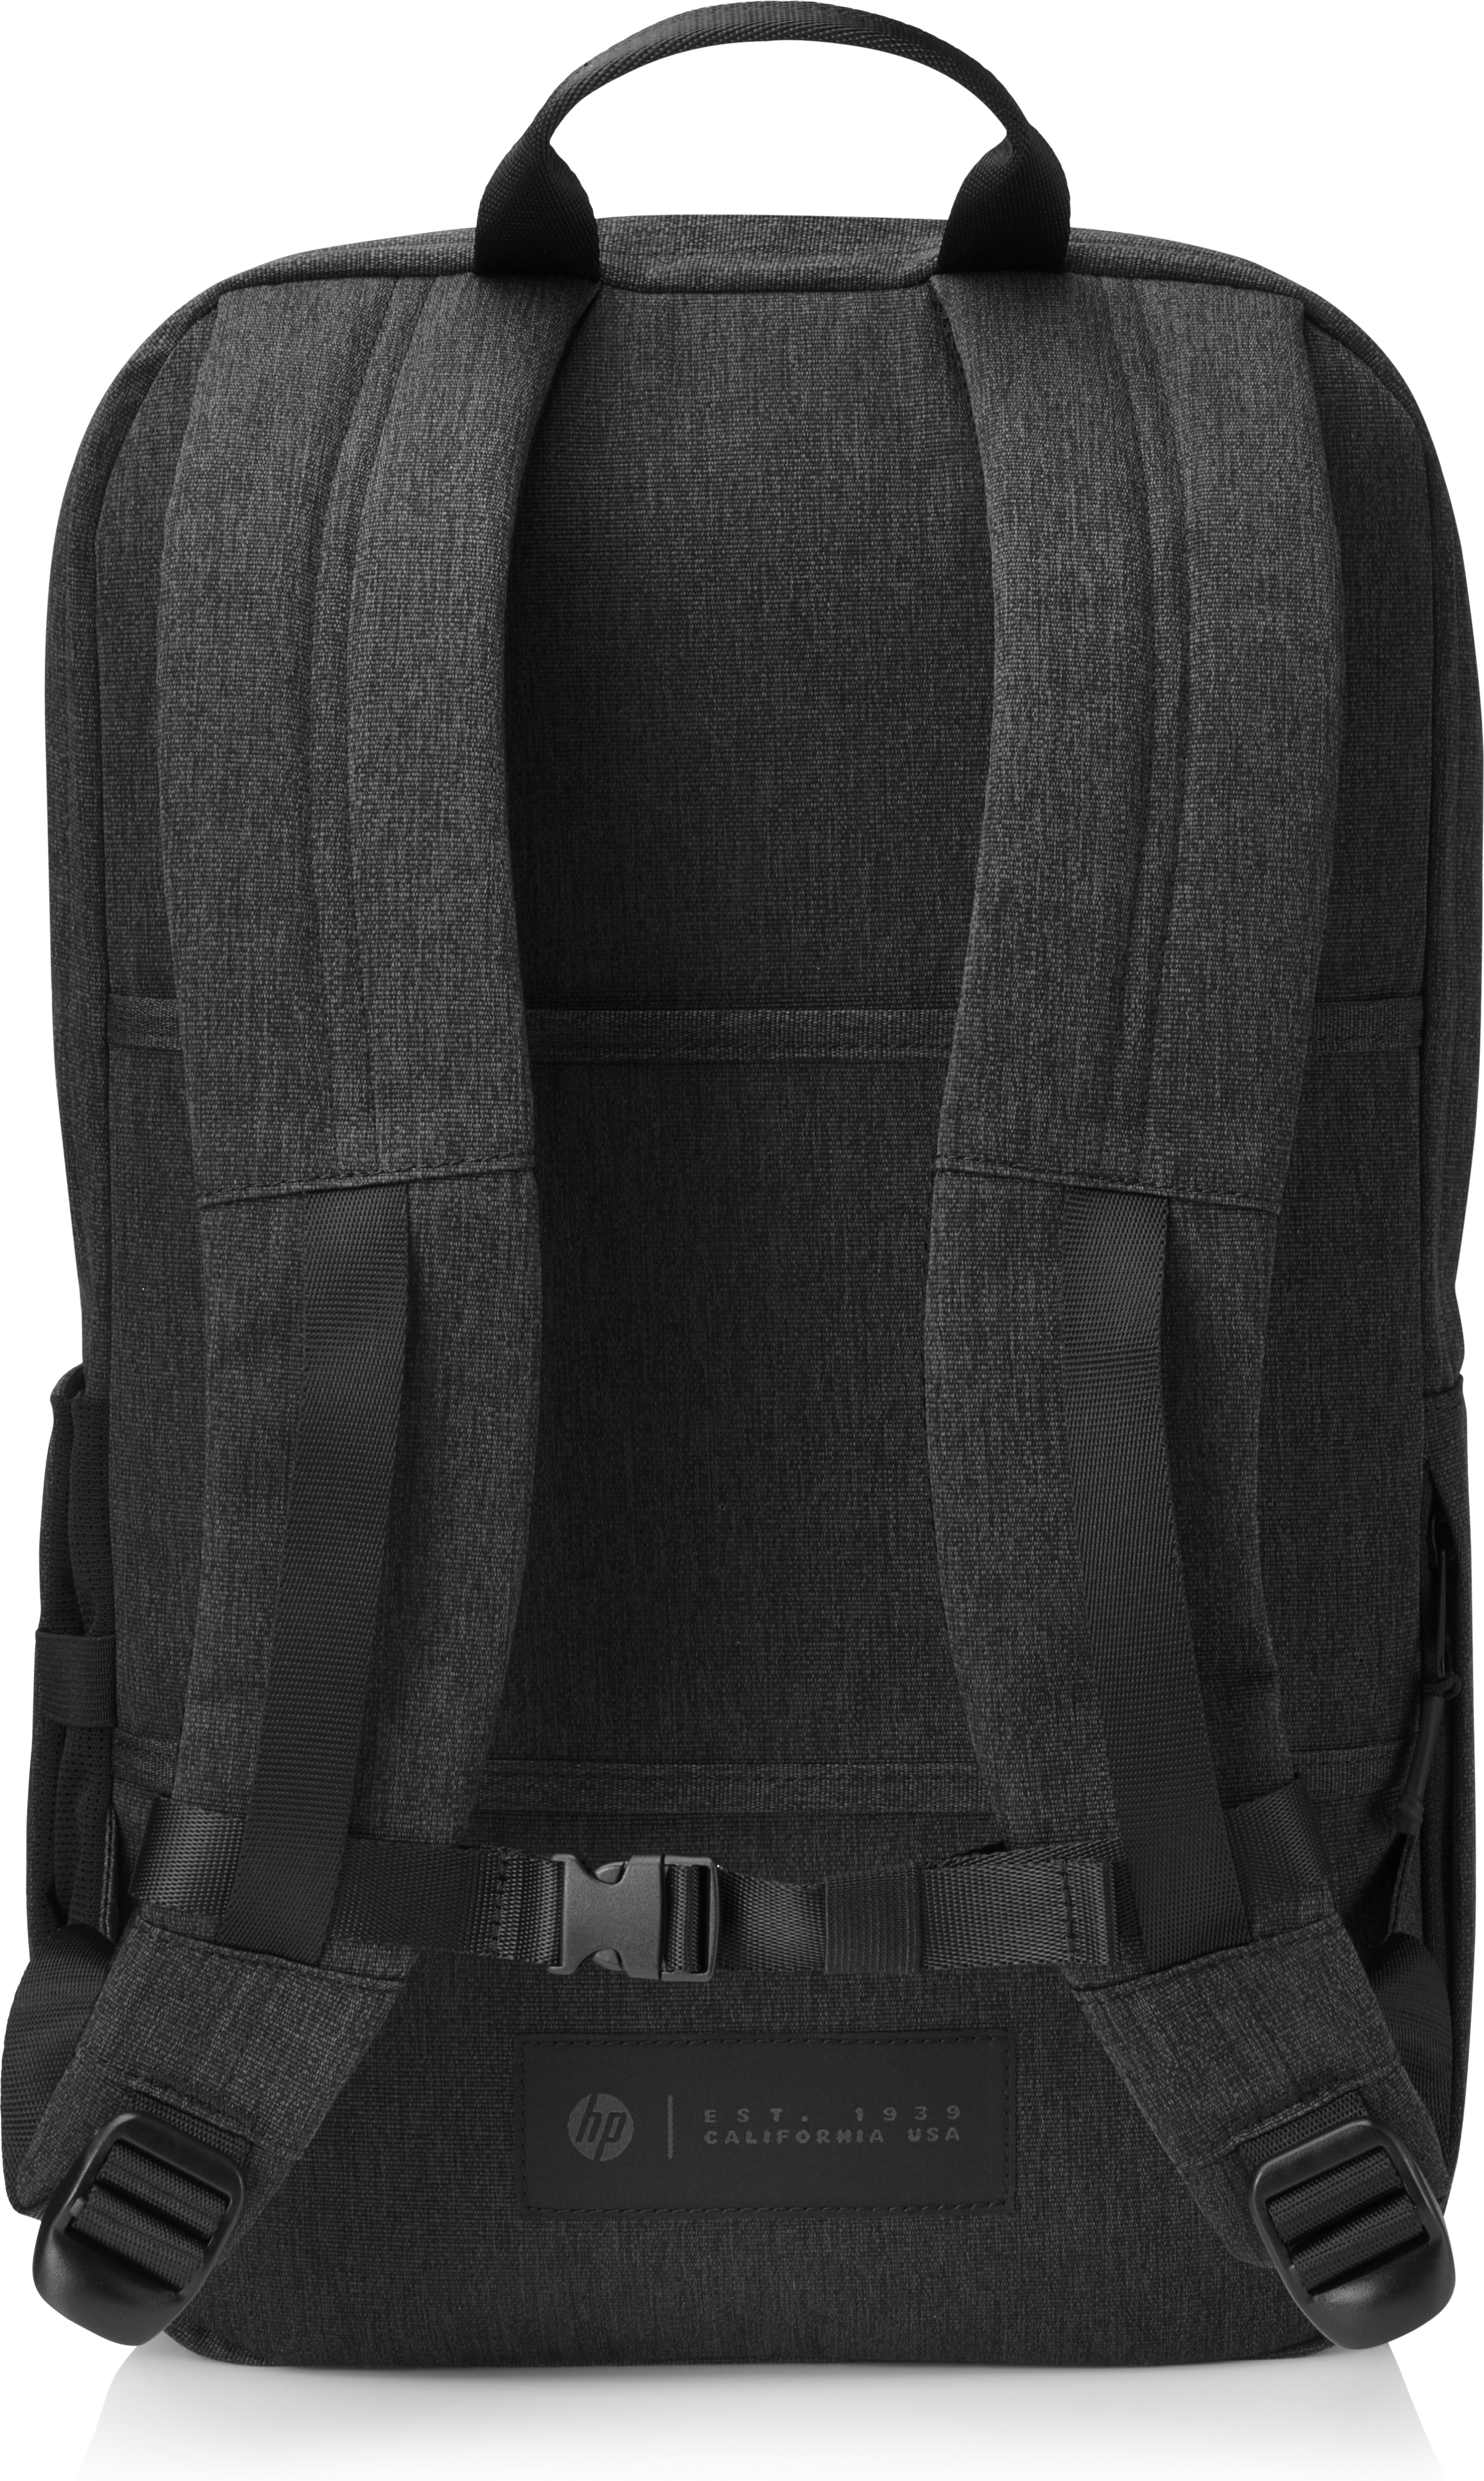 Lightweight 15 LT Backpack